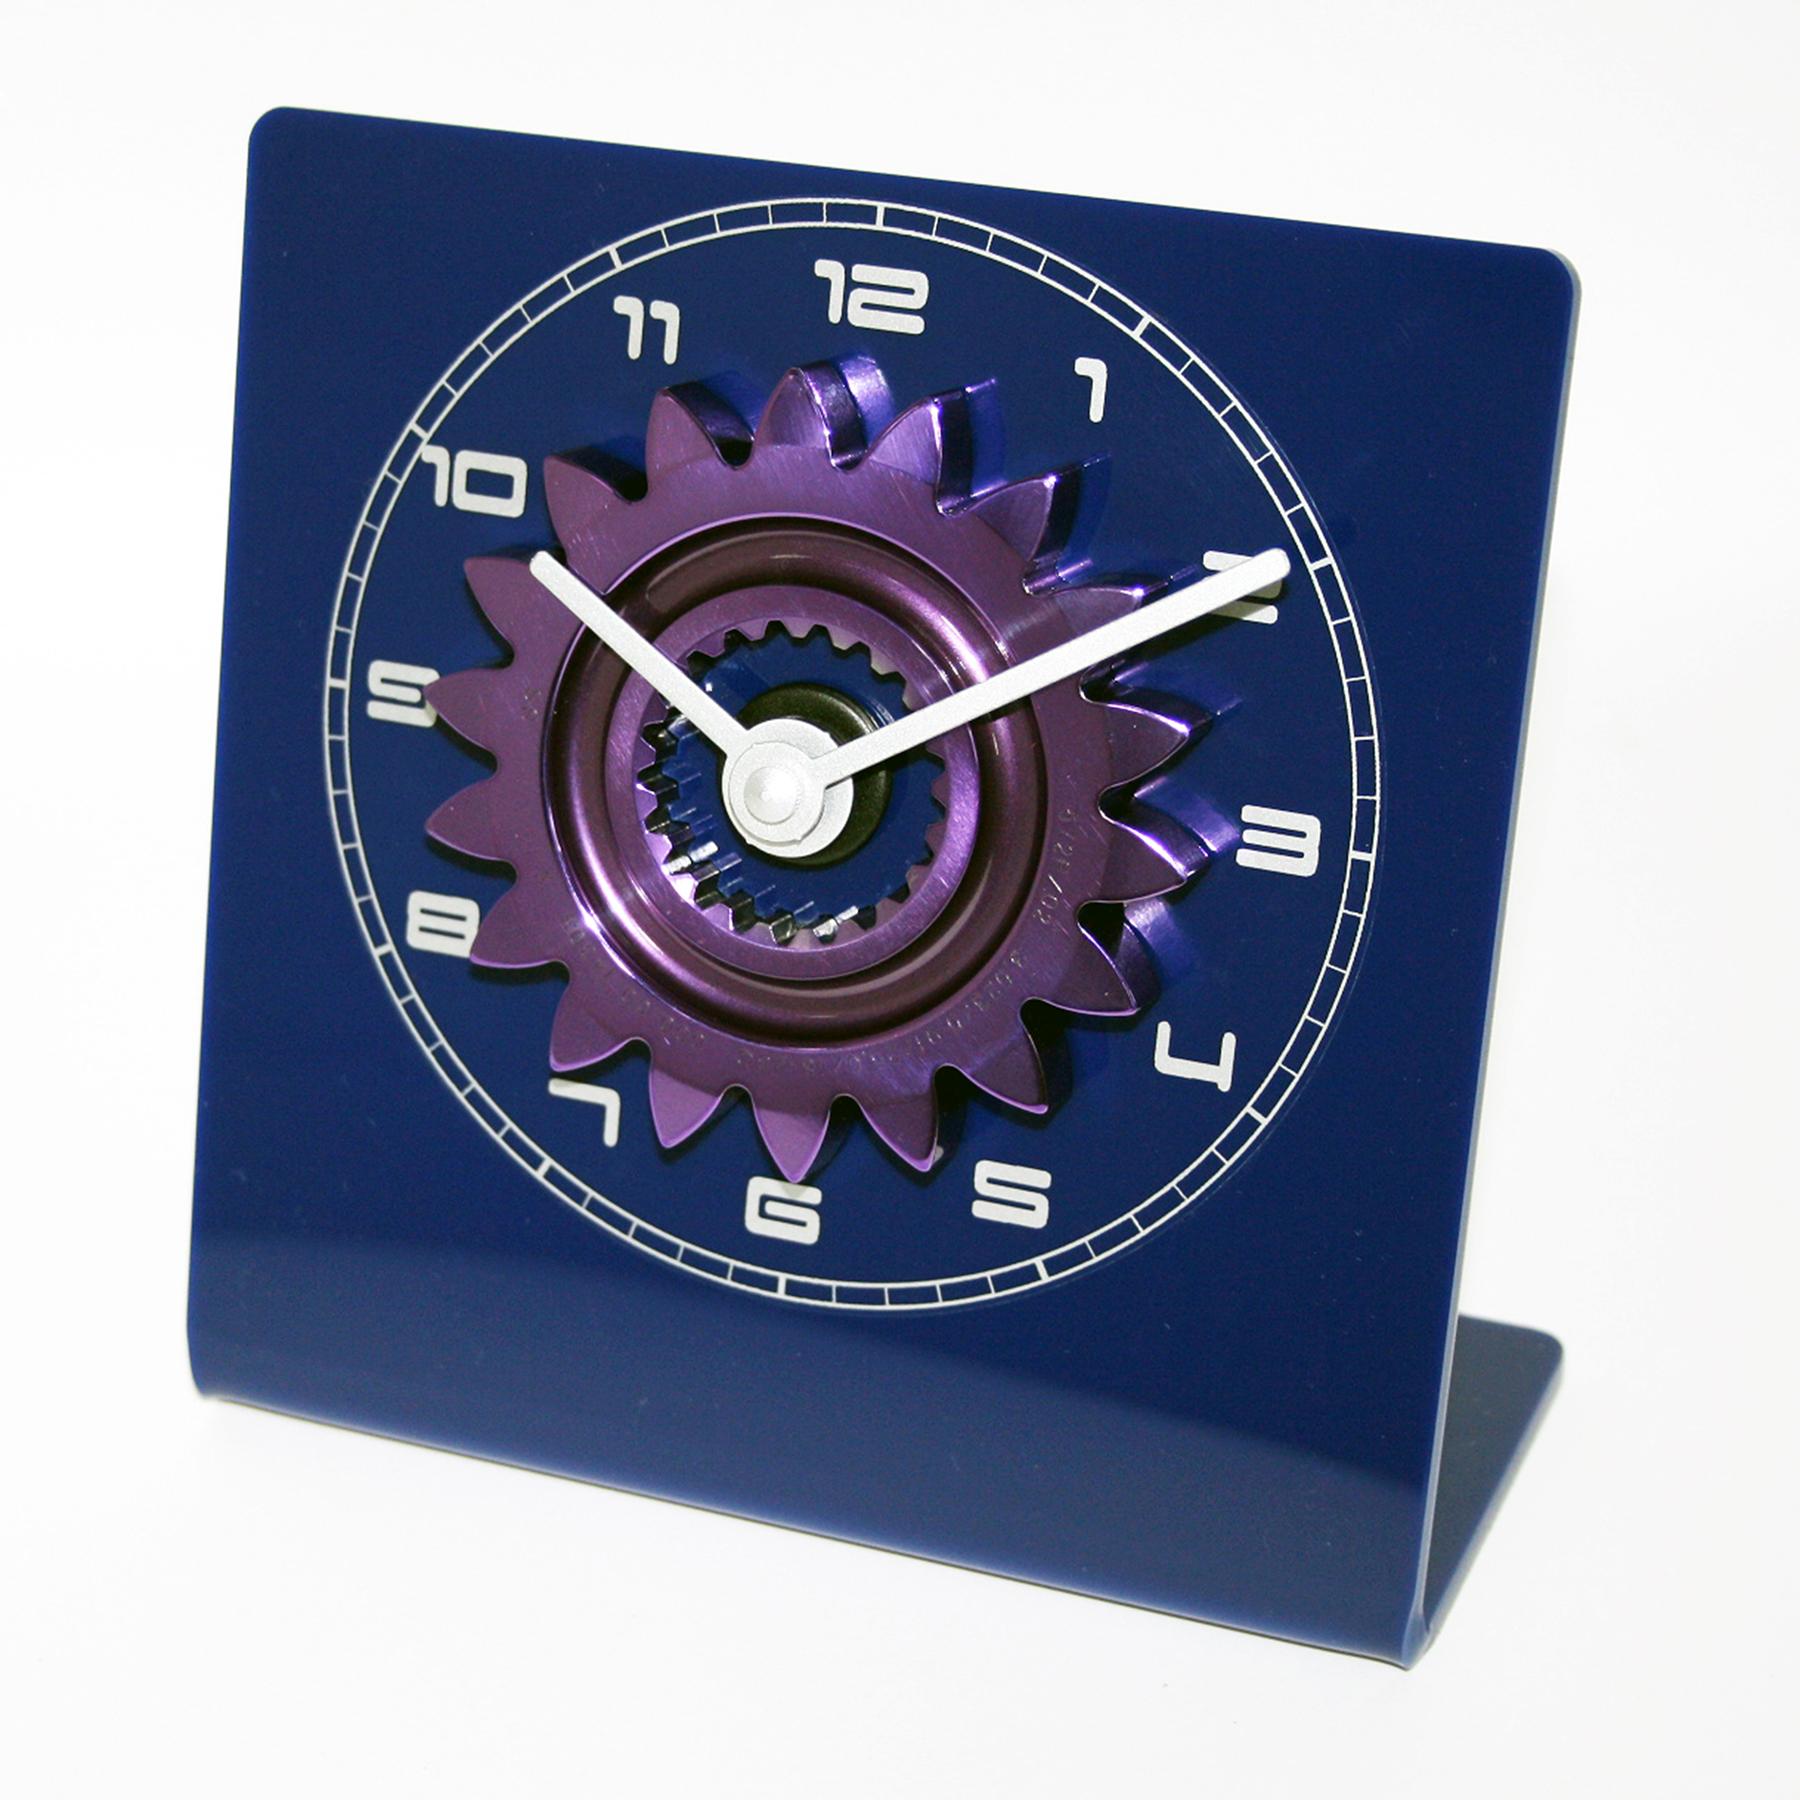 Formula One Gear Ratio Clock - Blue and Purple